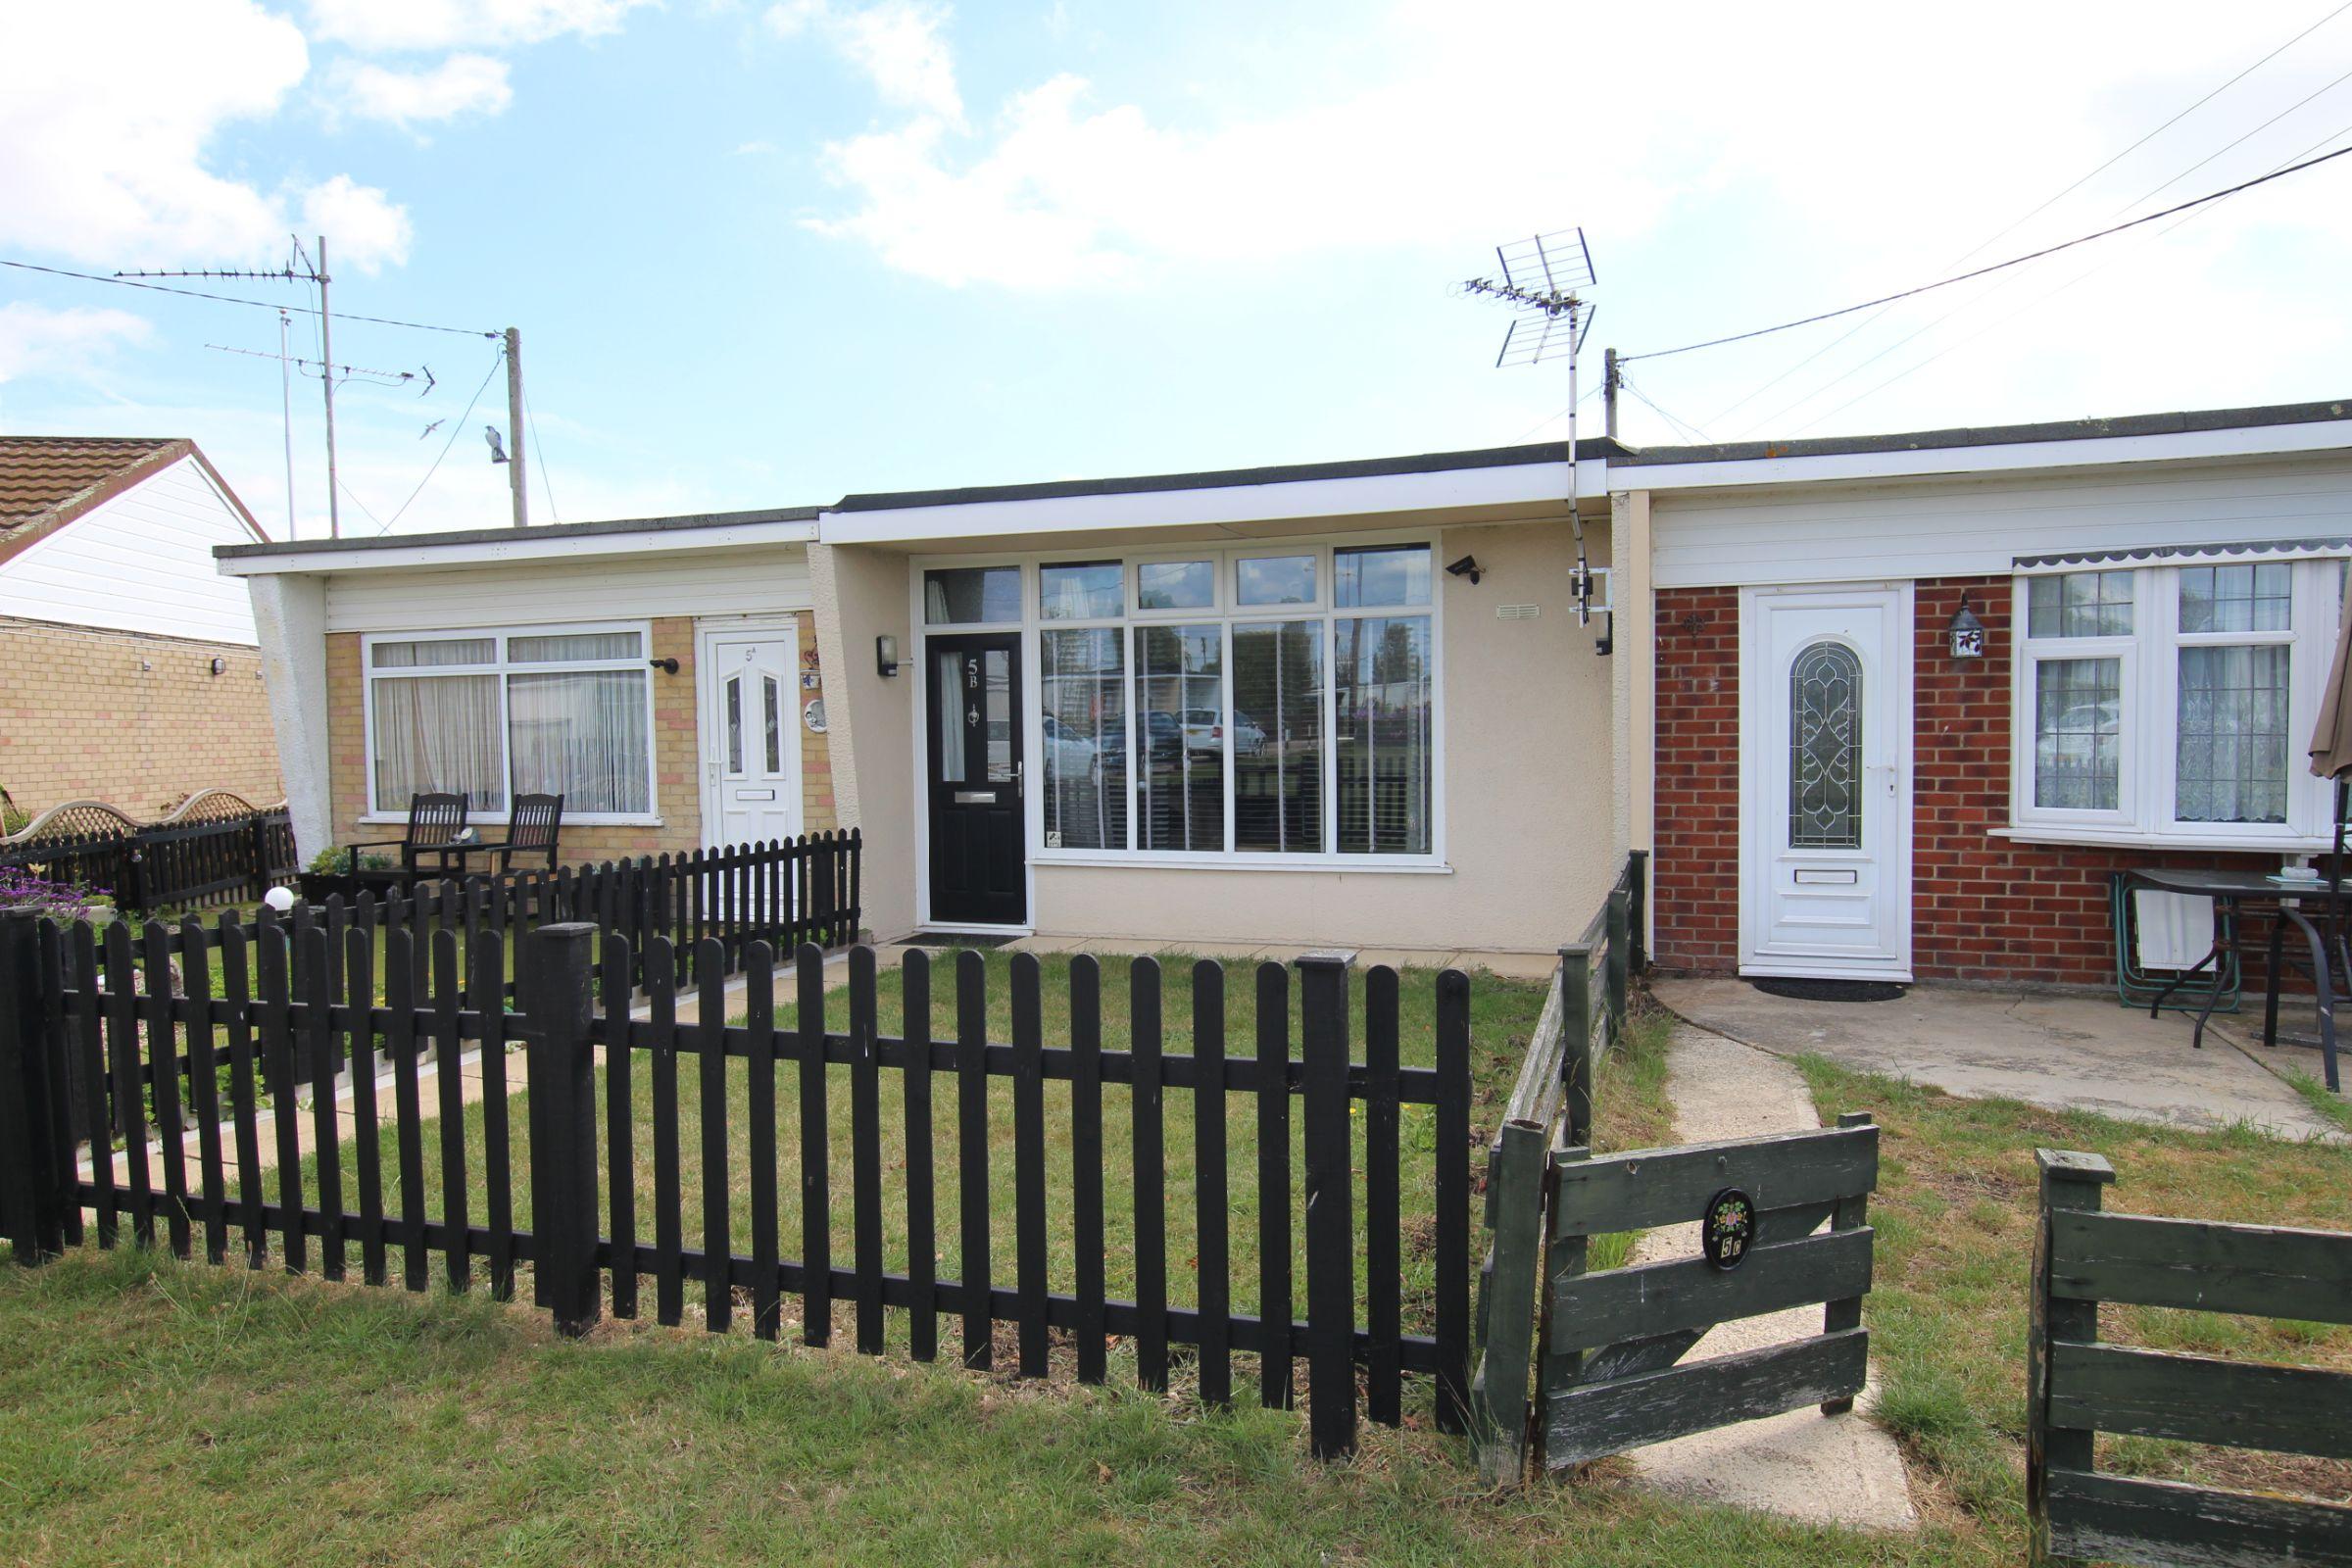 Bel Air Estate, St. Osyth, Clacton-on-Sea